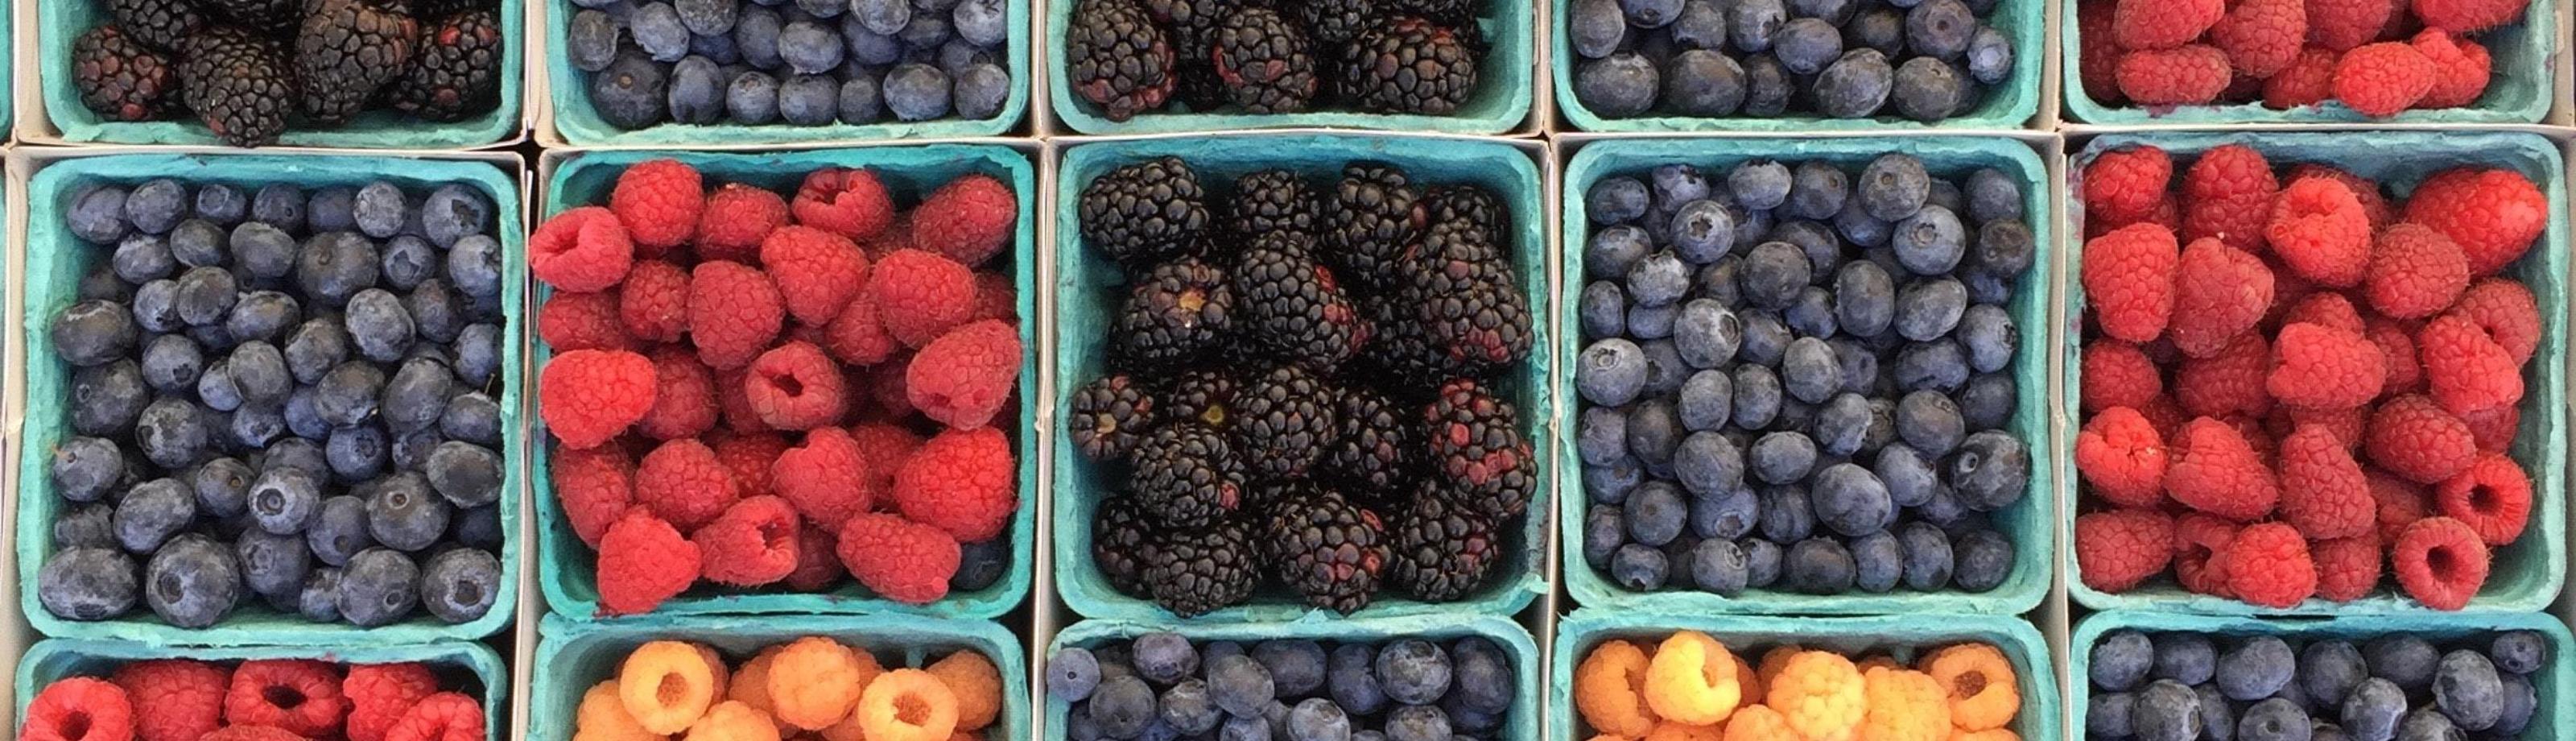 Wat is kwaliteit fruit